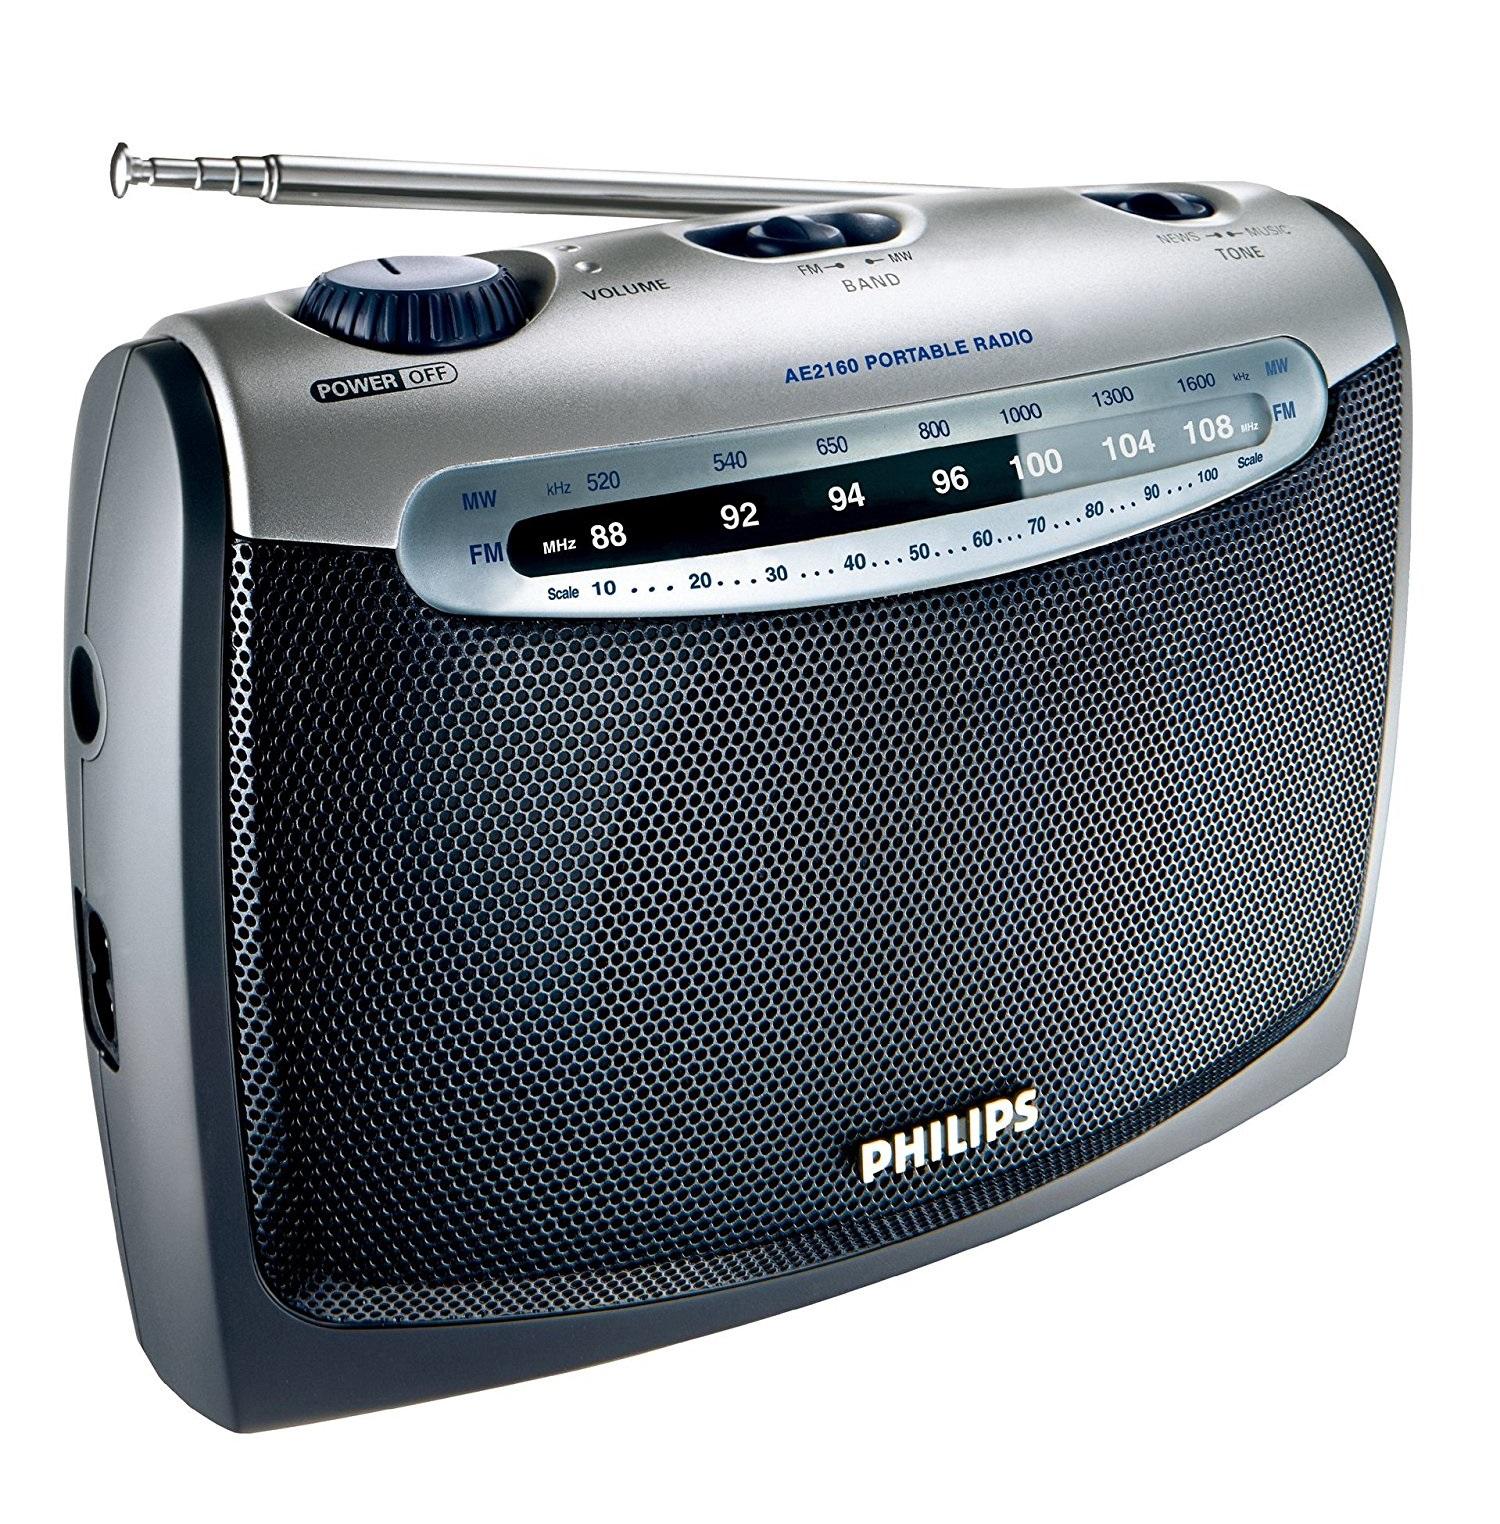 Les Meilleures Radios Portables Philips Comparatif En Ao T 2018